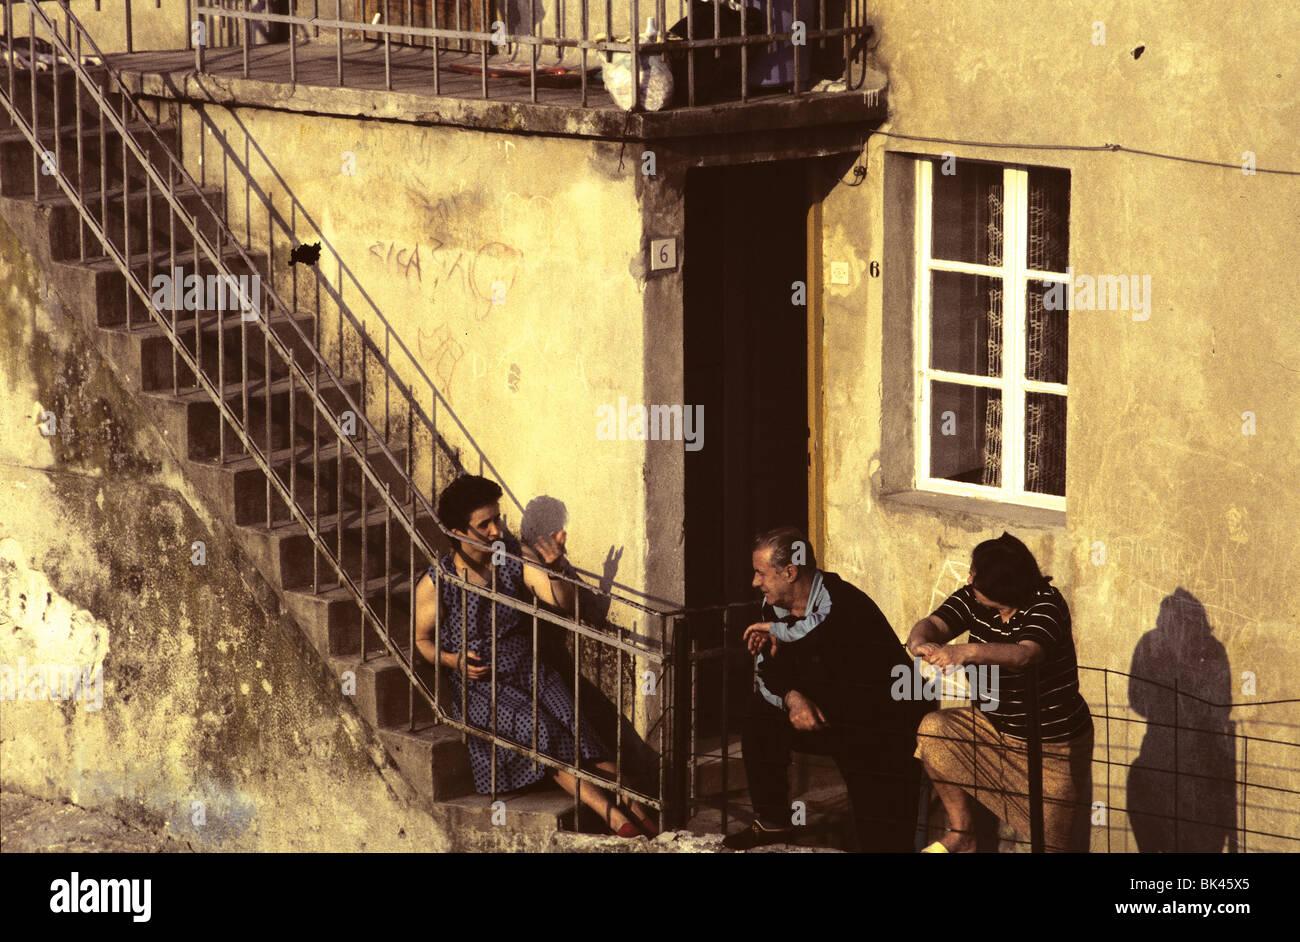 Neighbors having an evening conversion, Croatia - Stock Image